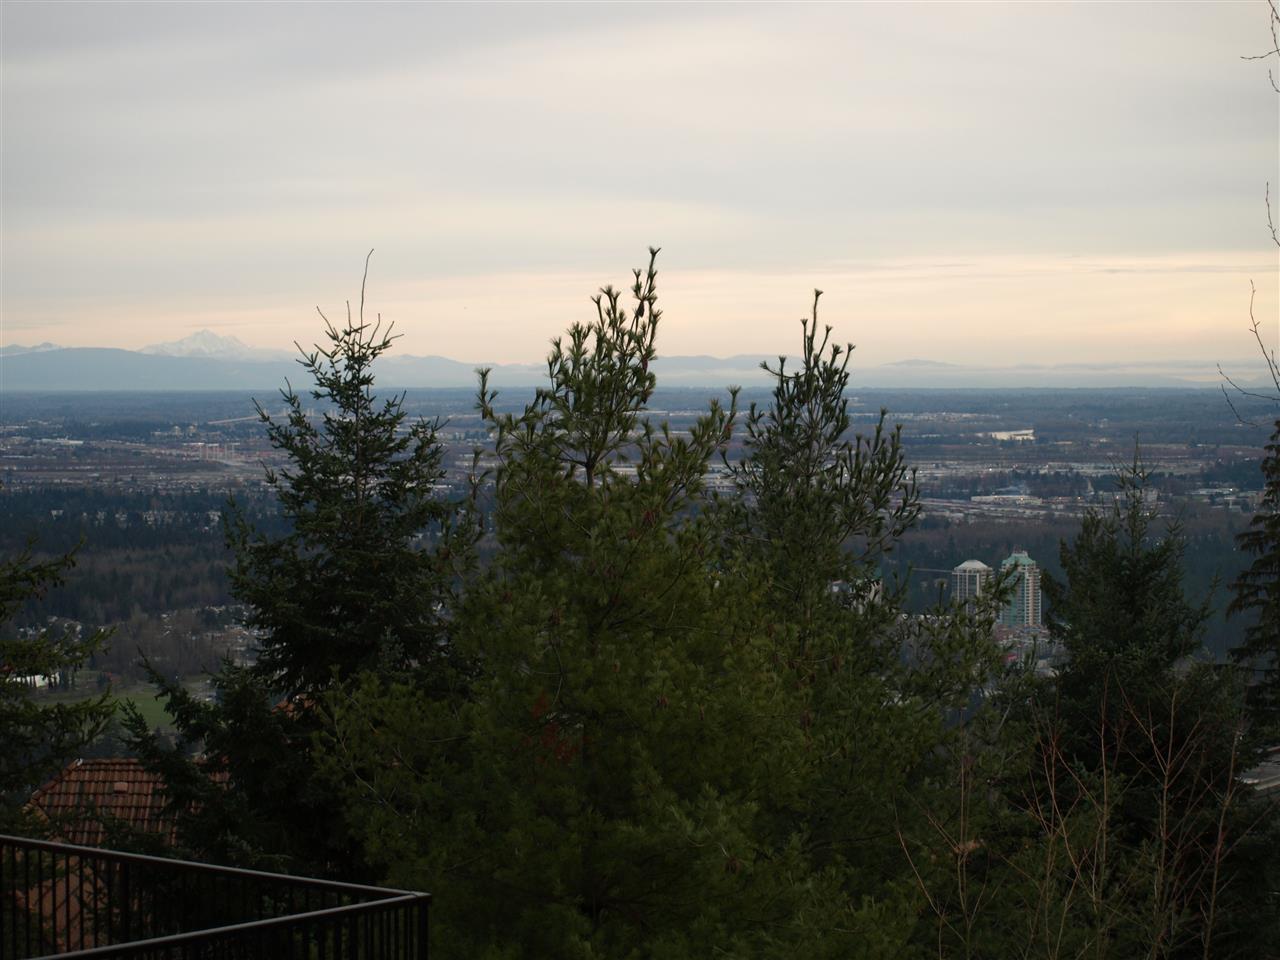 Main Photo: 2980 SUNRIDGE COURT in Coquitlam: Westwood Plateau House for sale : MLS®# R2185935